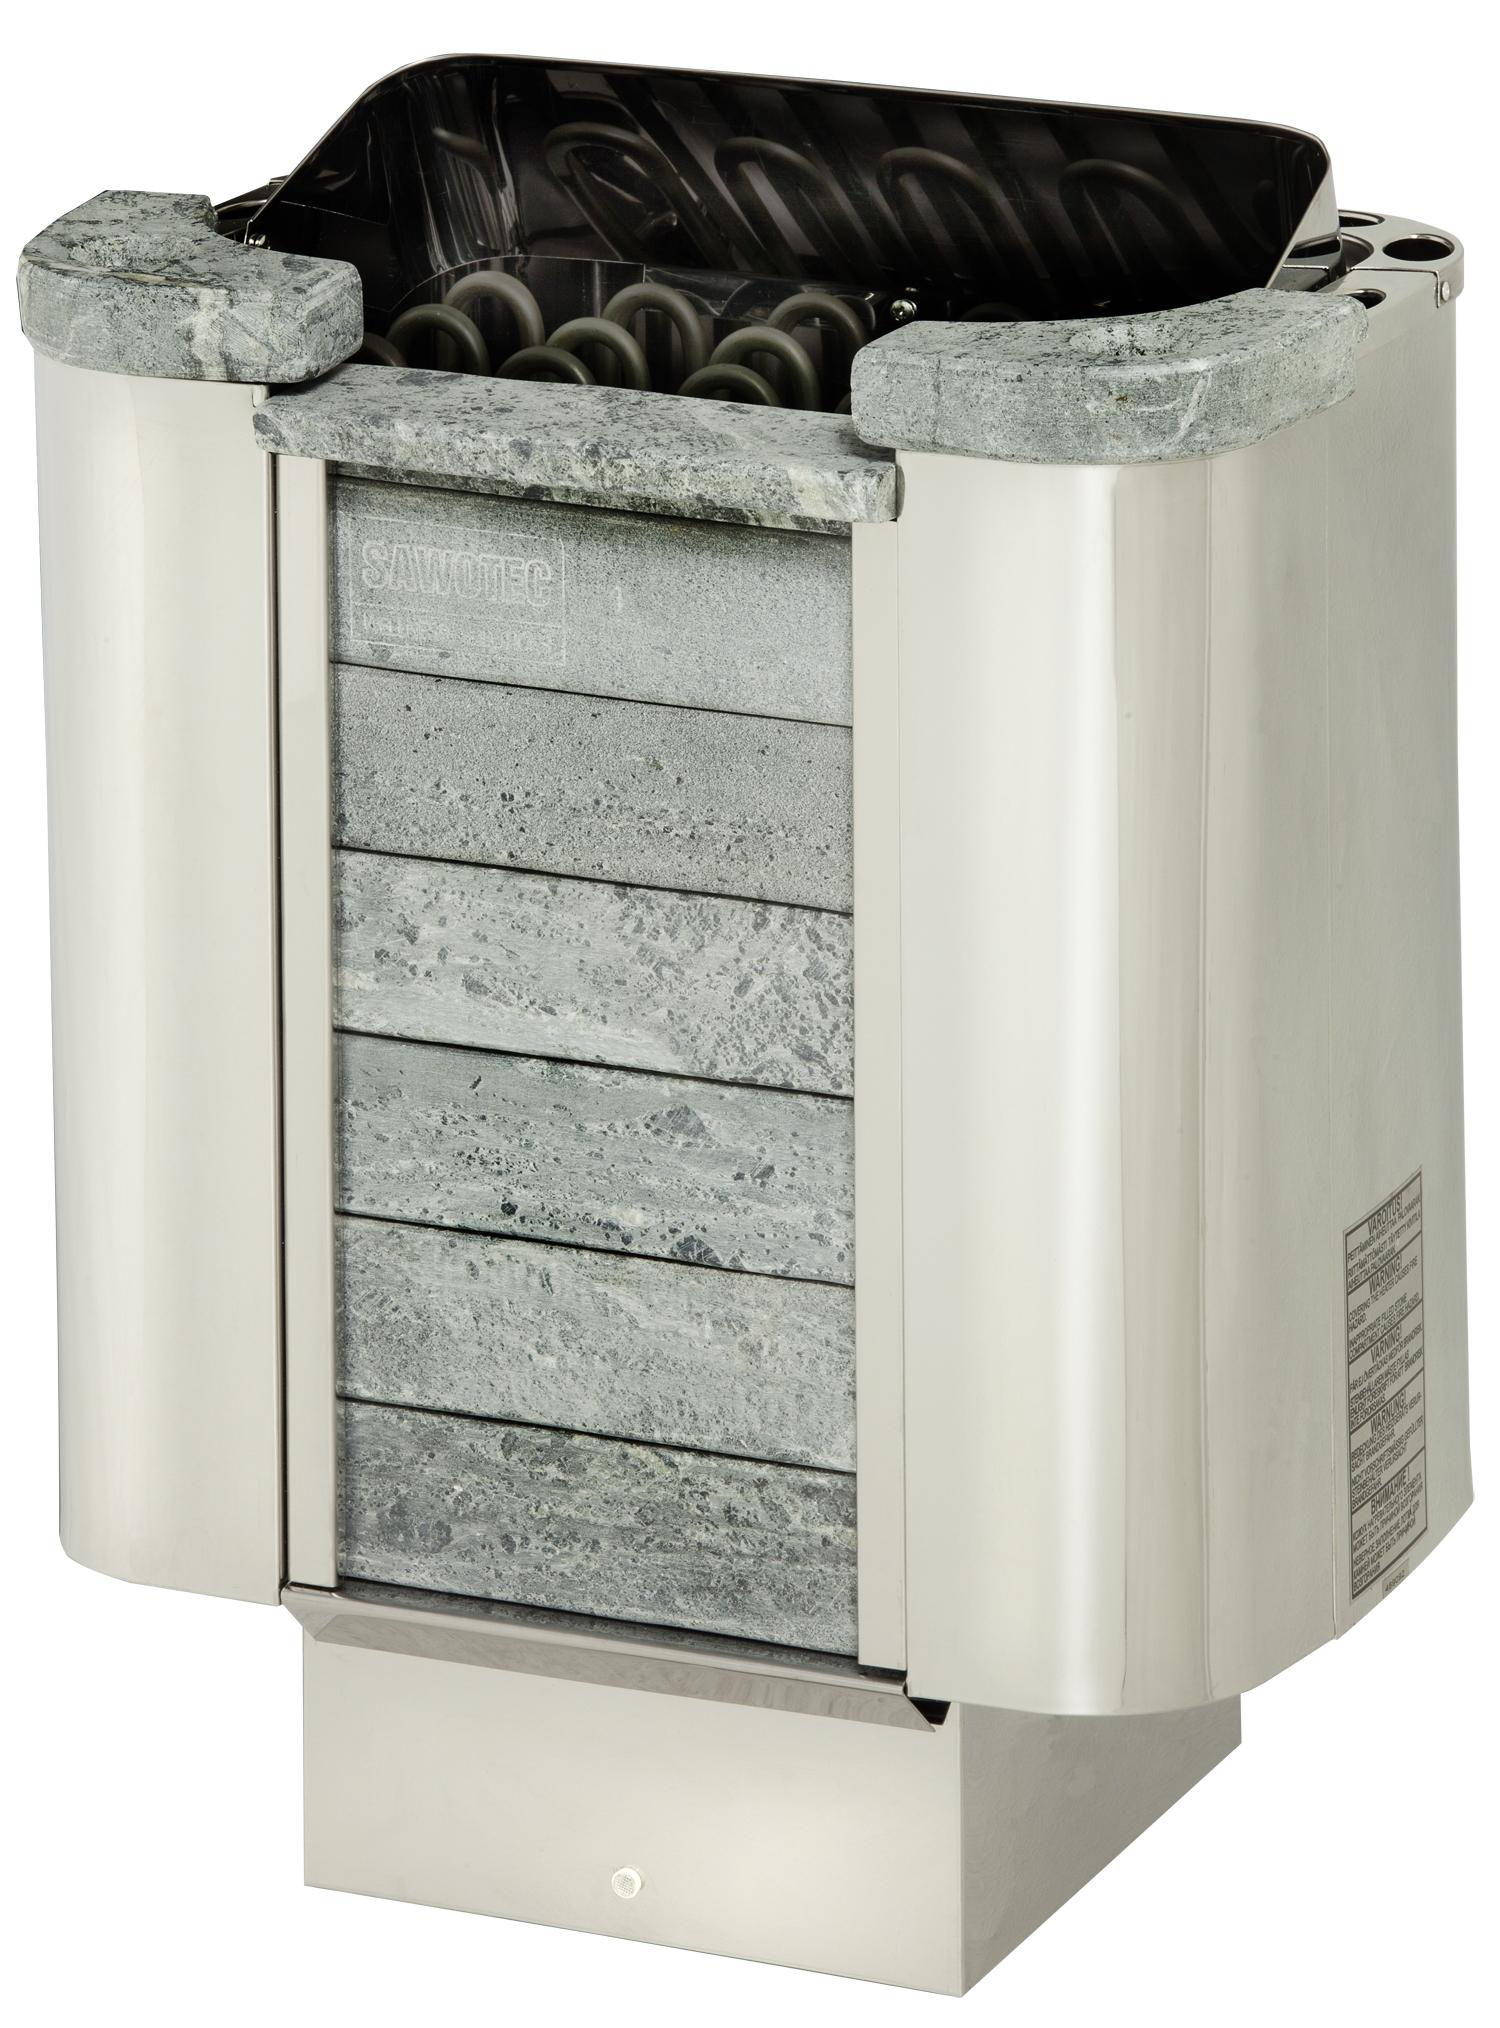 Sentiotec Cumulus Specksteinofen 9 kW CML-90NS-P